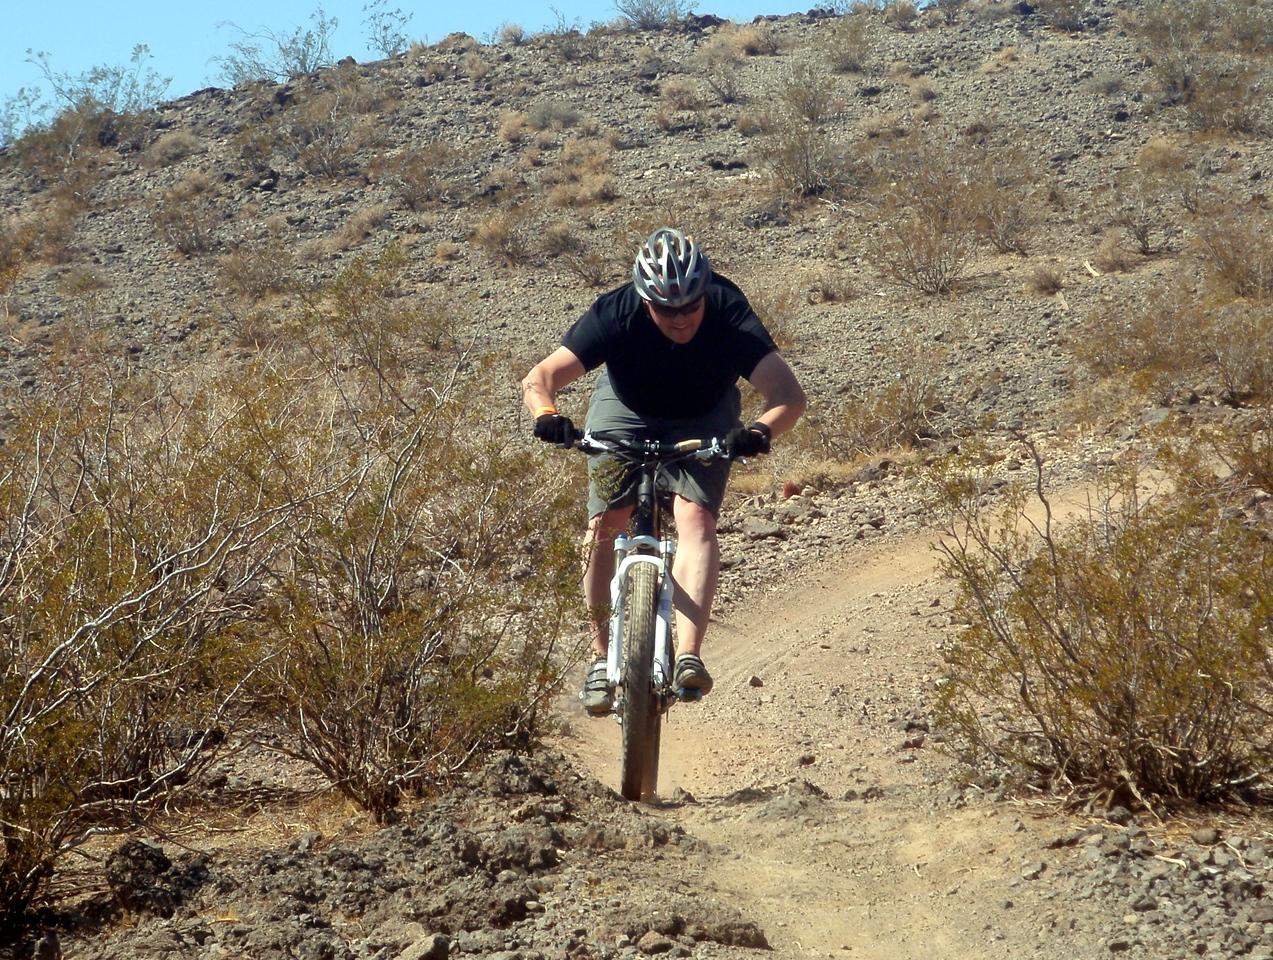 Jon Severson, Peak Region Cyclist